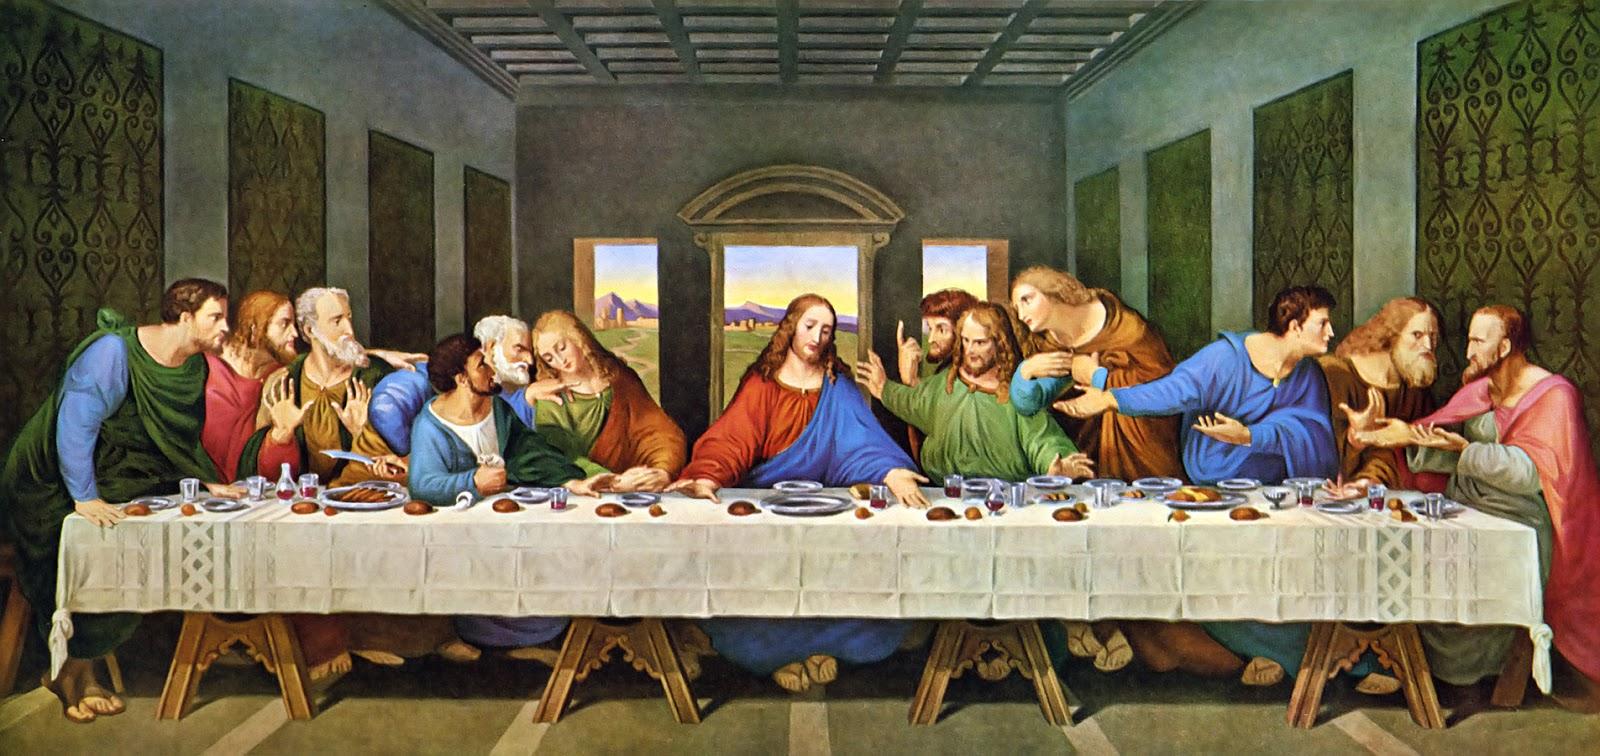 Da Vinci - Suas 5 principais pinturas